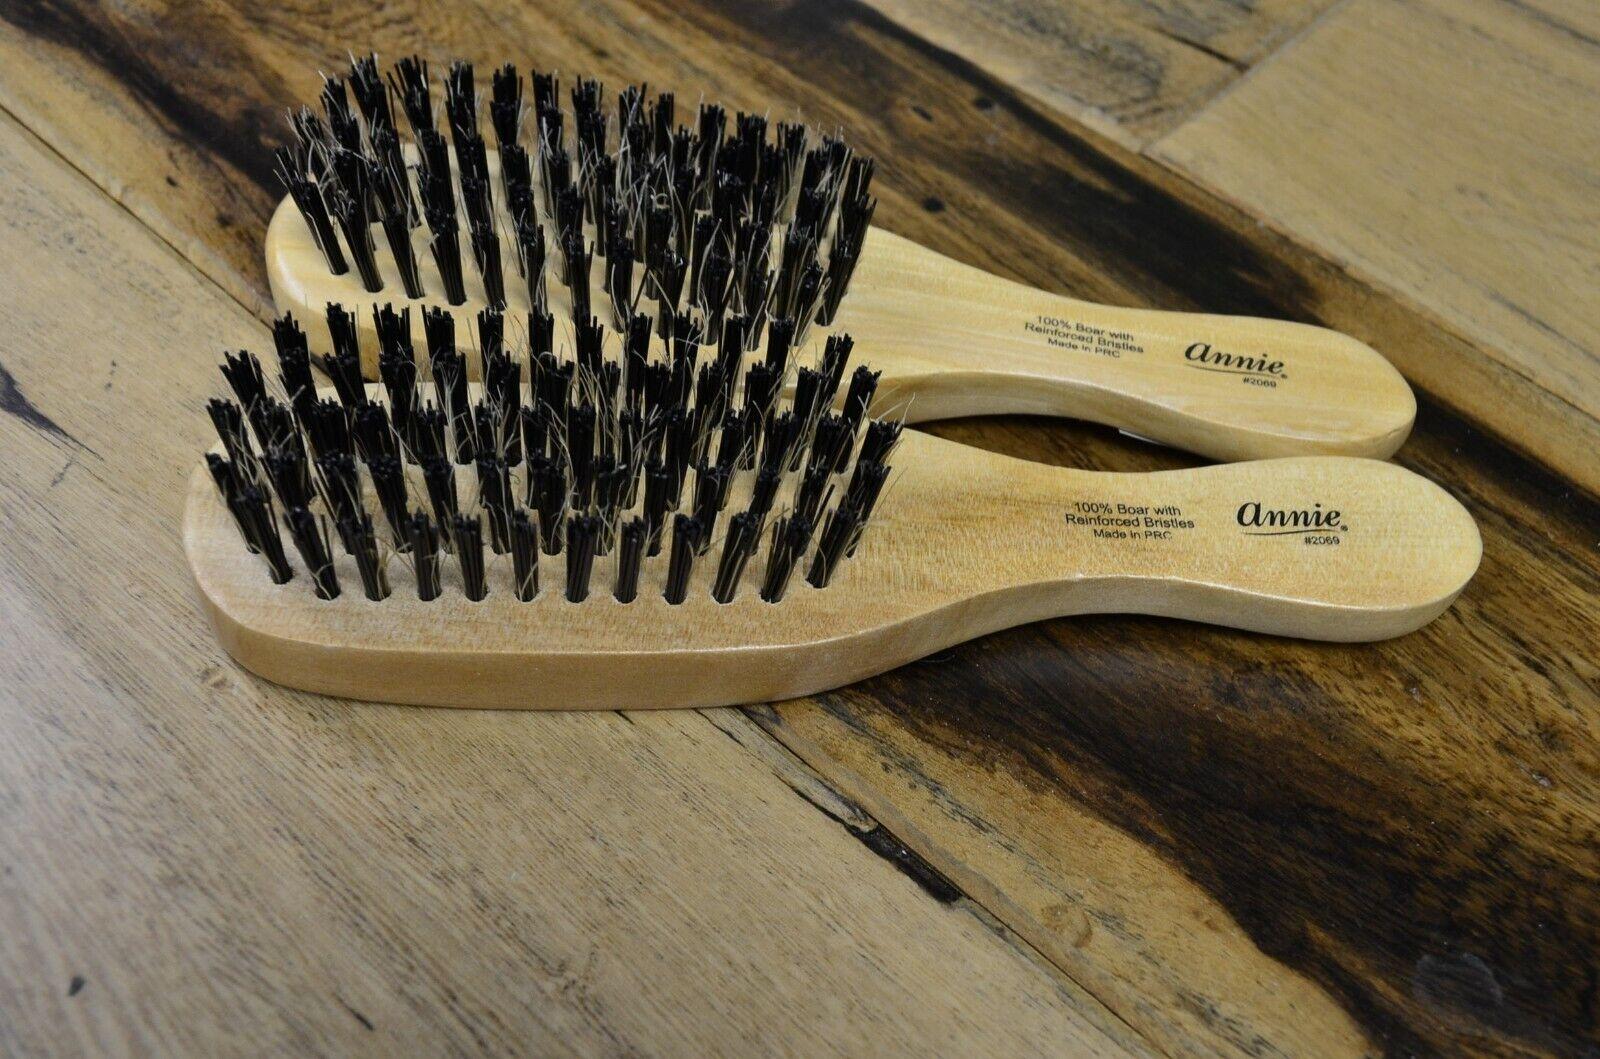 Annie Mini Wave Brush Hard Bristles 100% Boar Hair Styling C